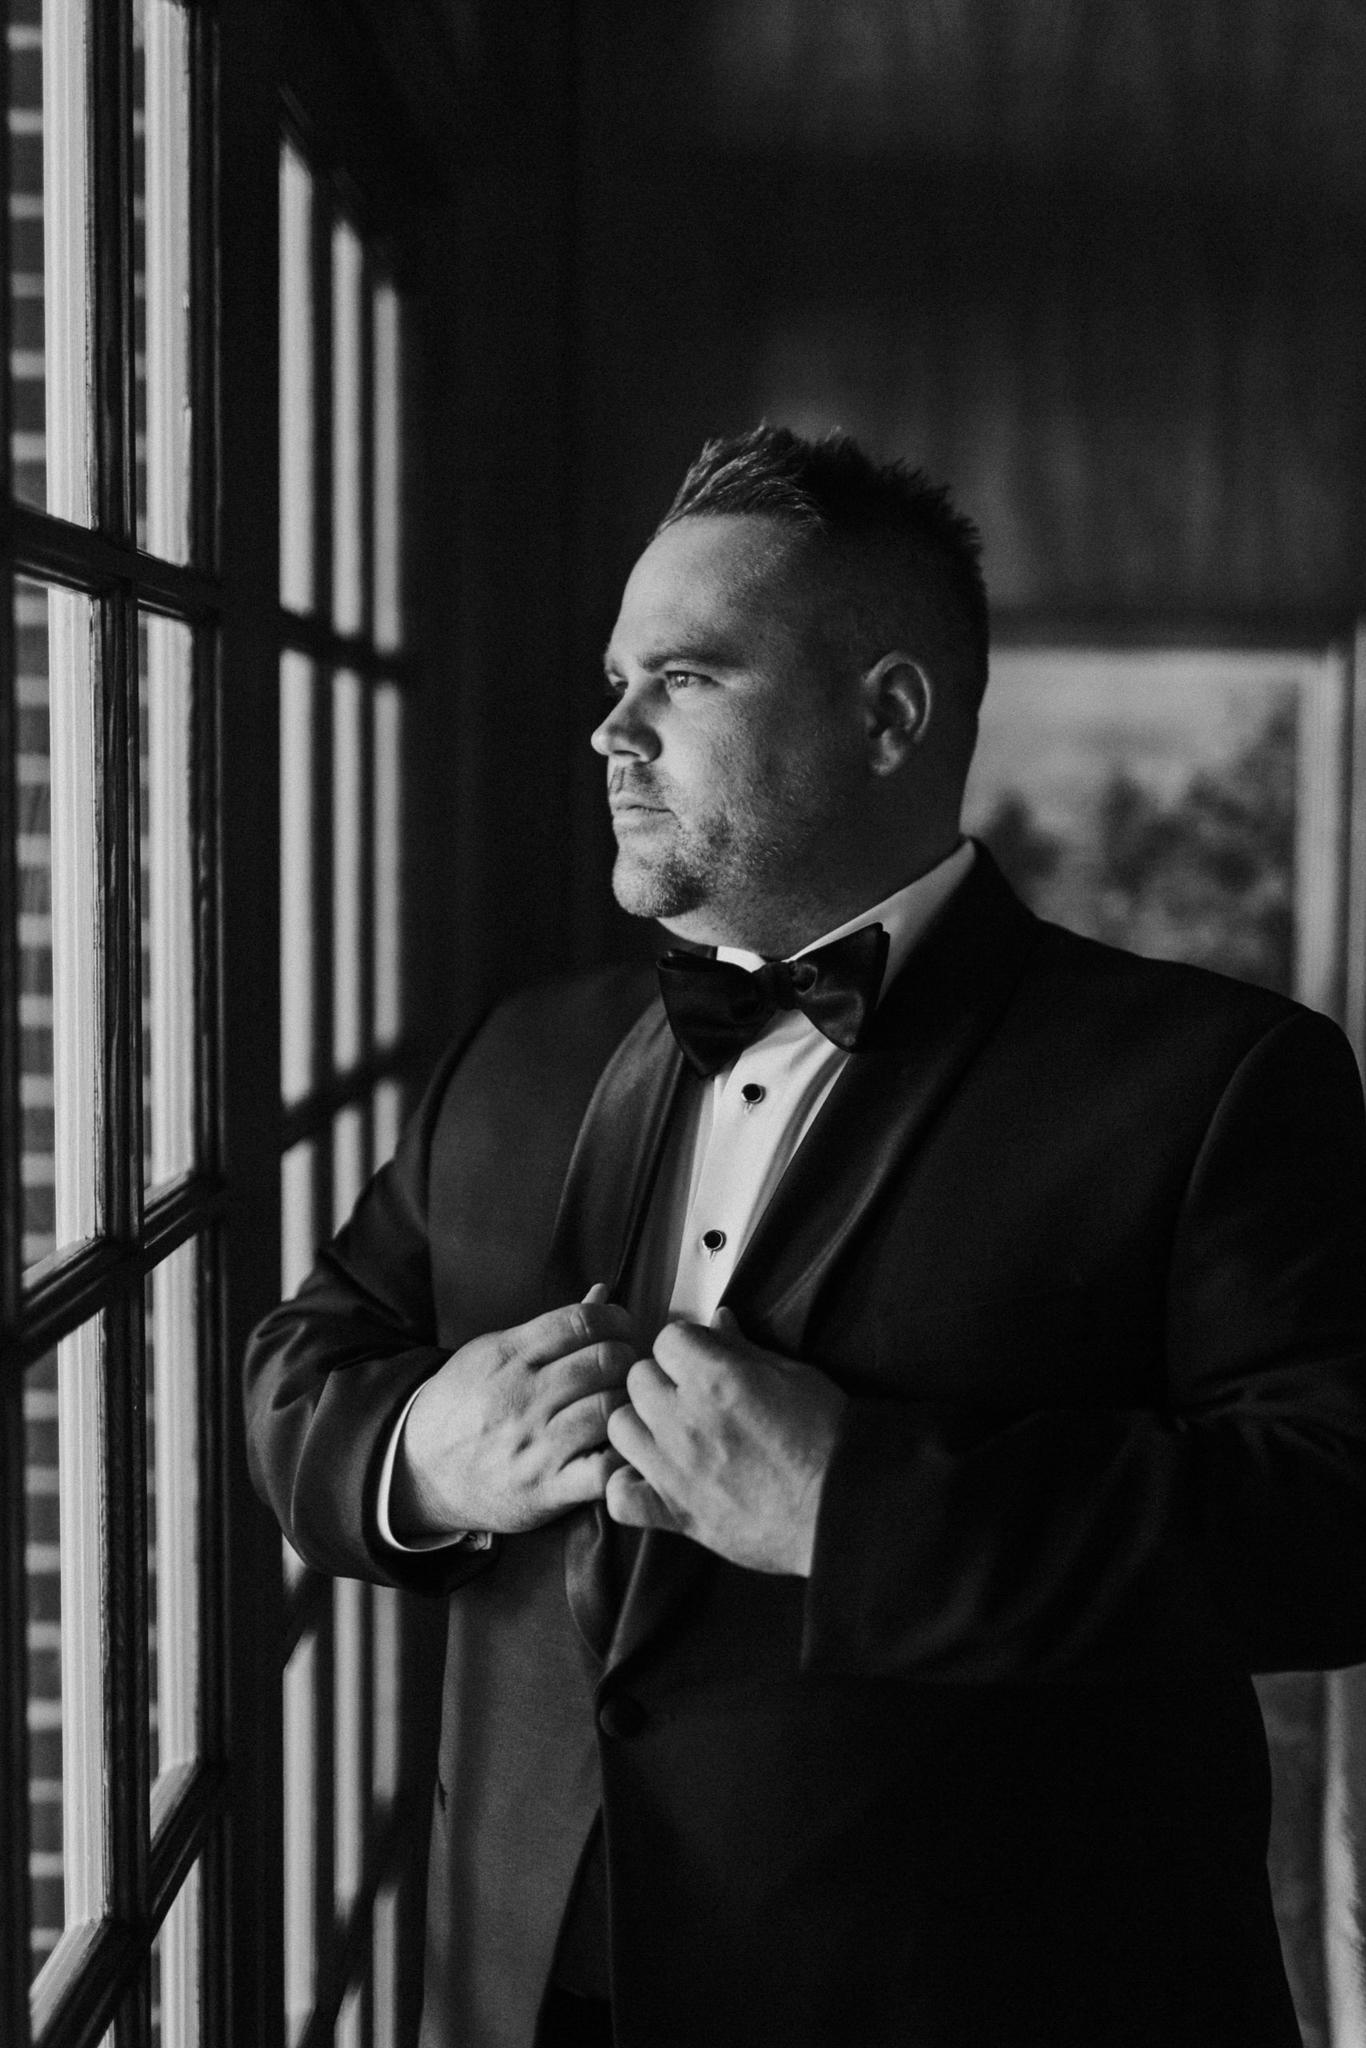 Houston Wedding Photographer-Intimate Texas Backyard Wedding- Houston Wedding Photographer -Kristen Giles Photography-22.jpg